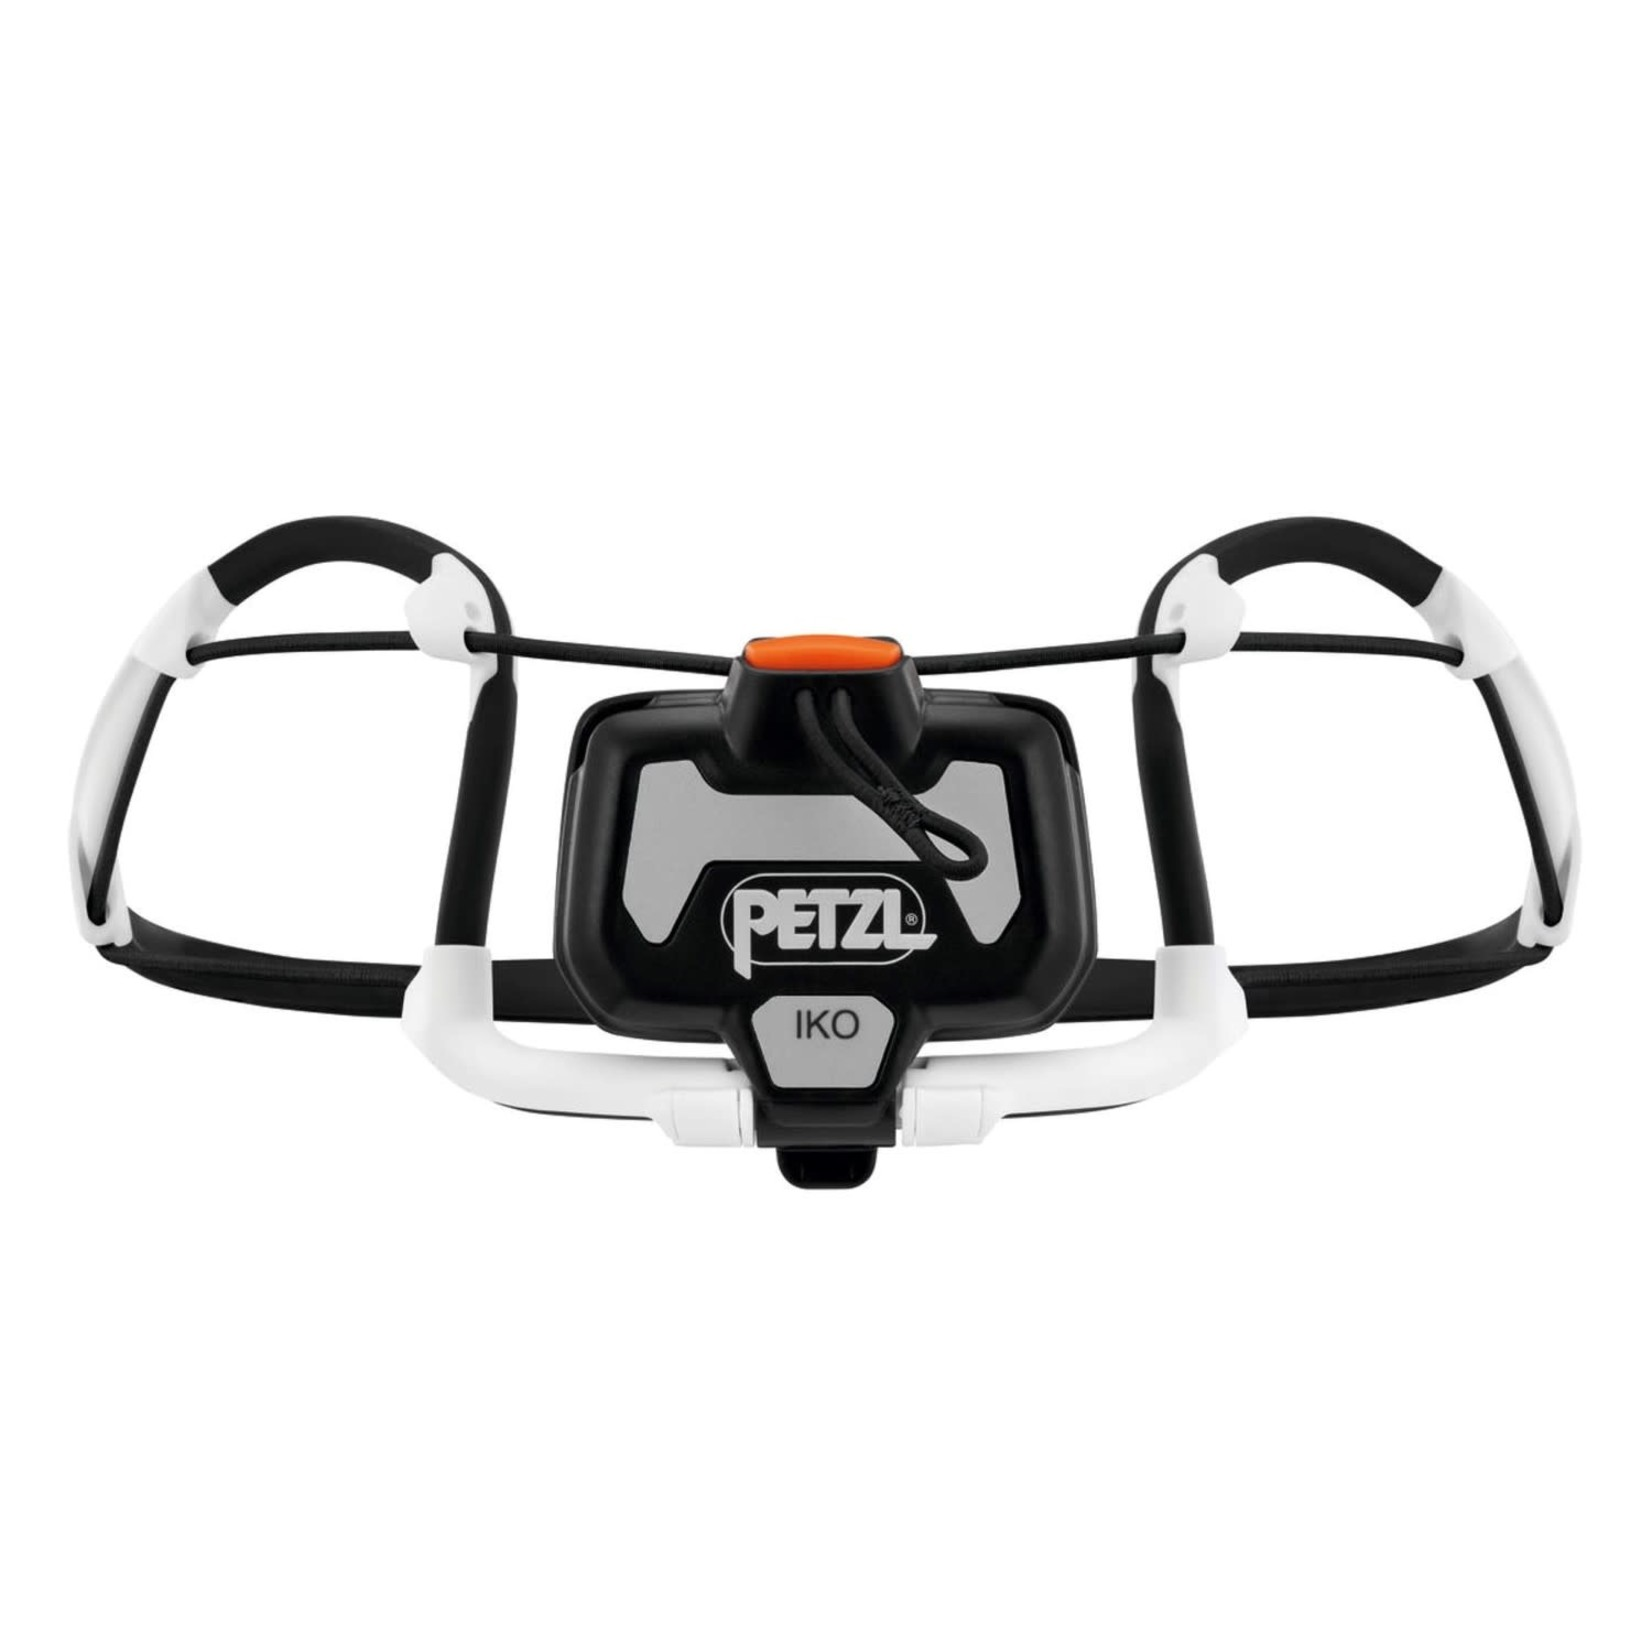 Petzl Petzl Iko Headlamp - 350 Lumen